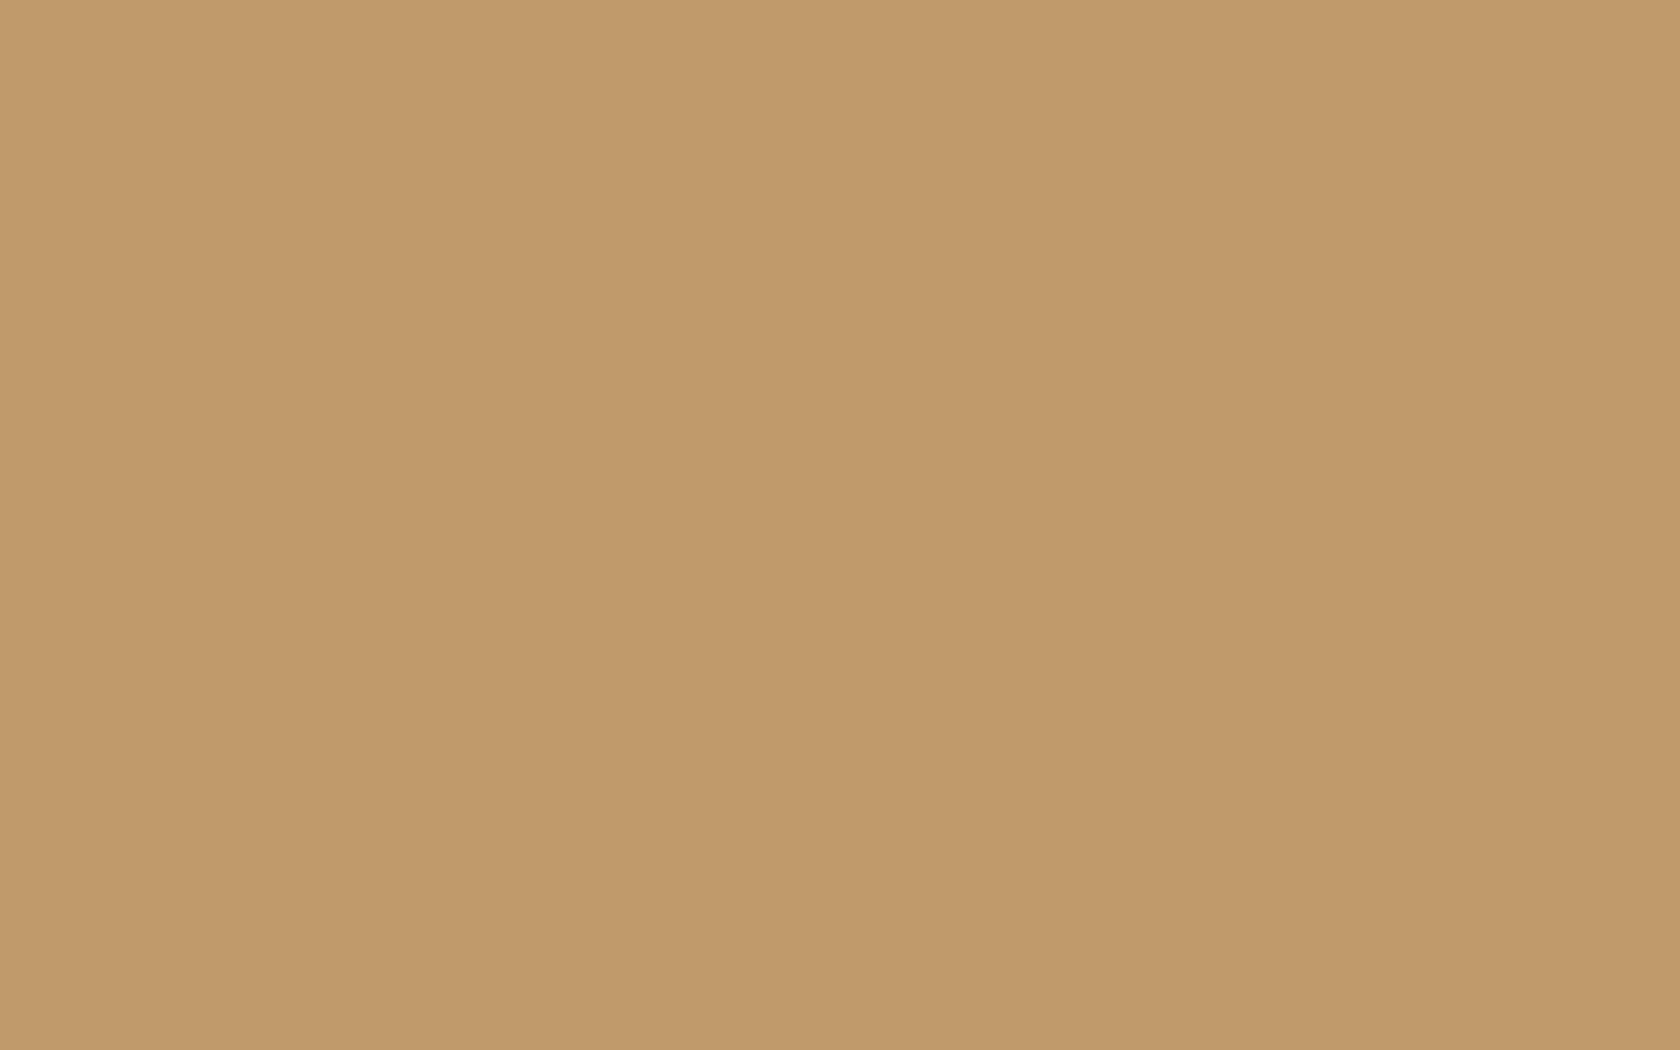 1680x1050 Lion Solid Color Background